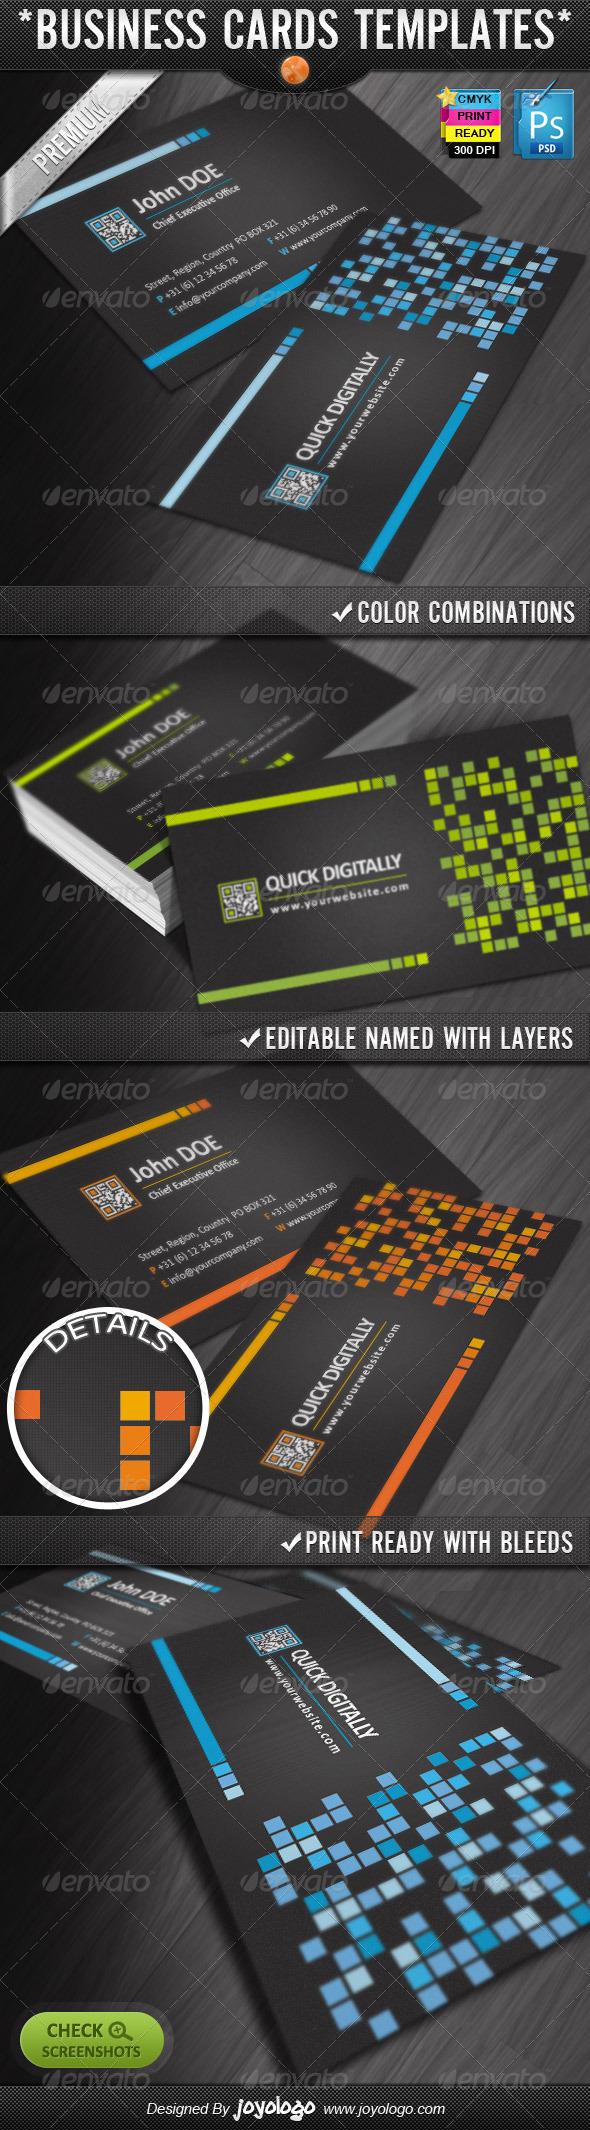 GraphicRiver Digitally Quick Response Business Cards Designs 2301371